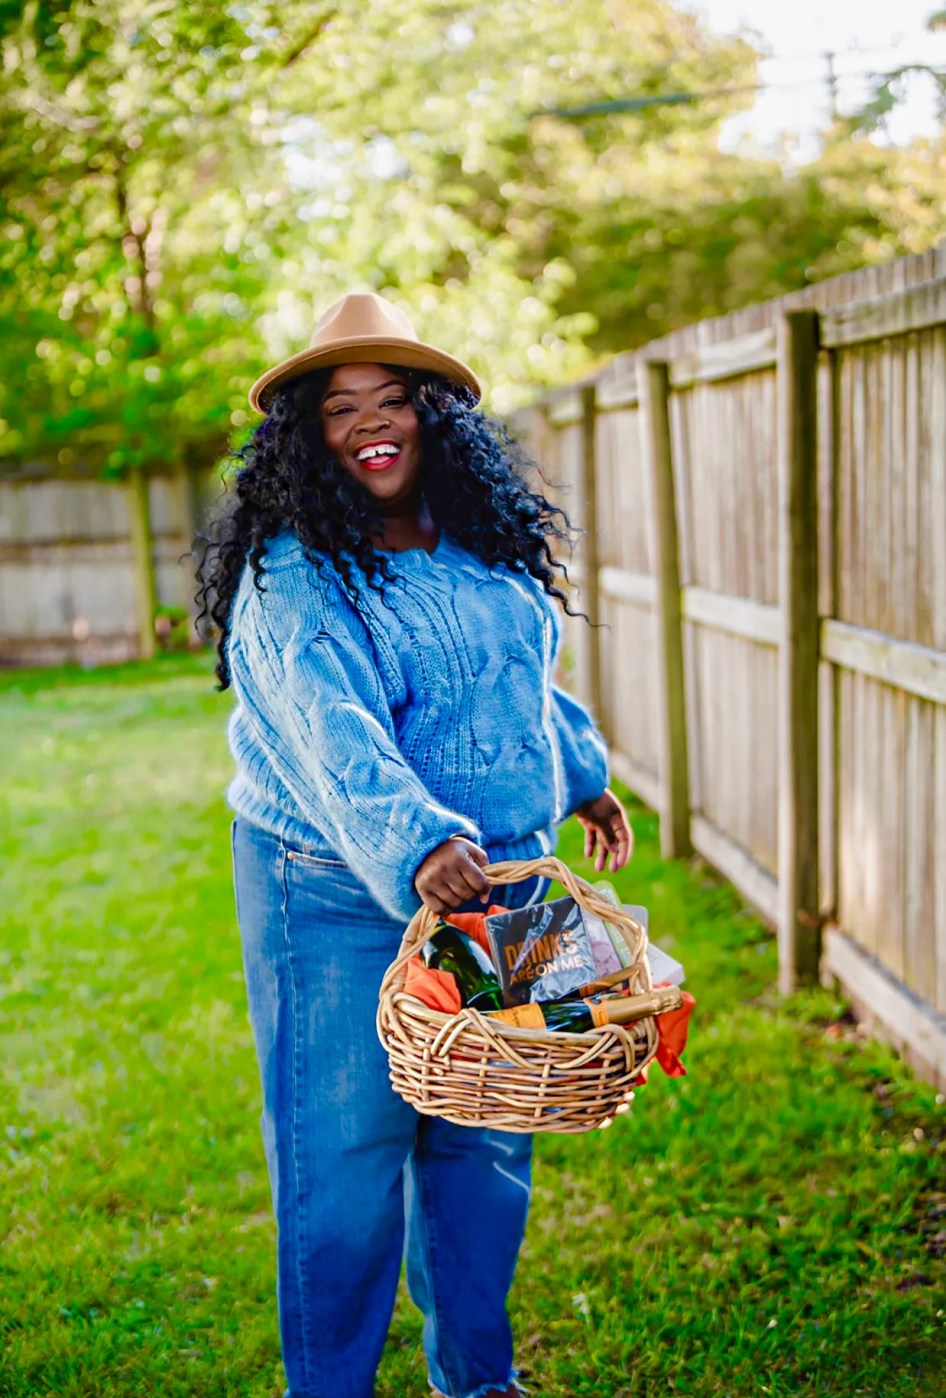 Veuve Clicquot Picnic basket, thefatgirloffashion.com